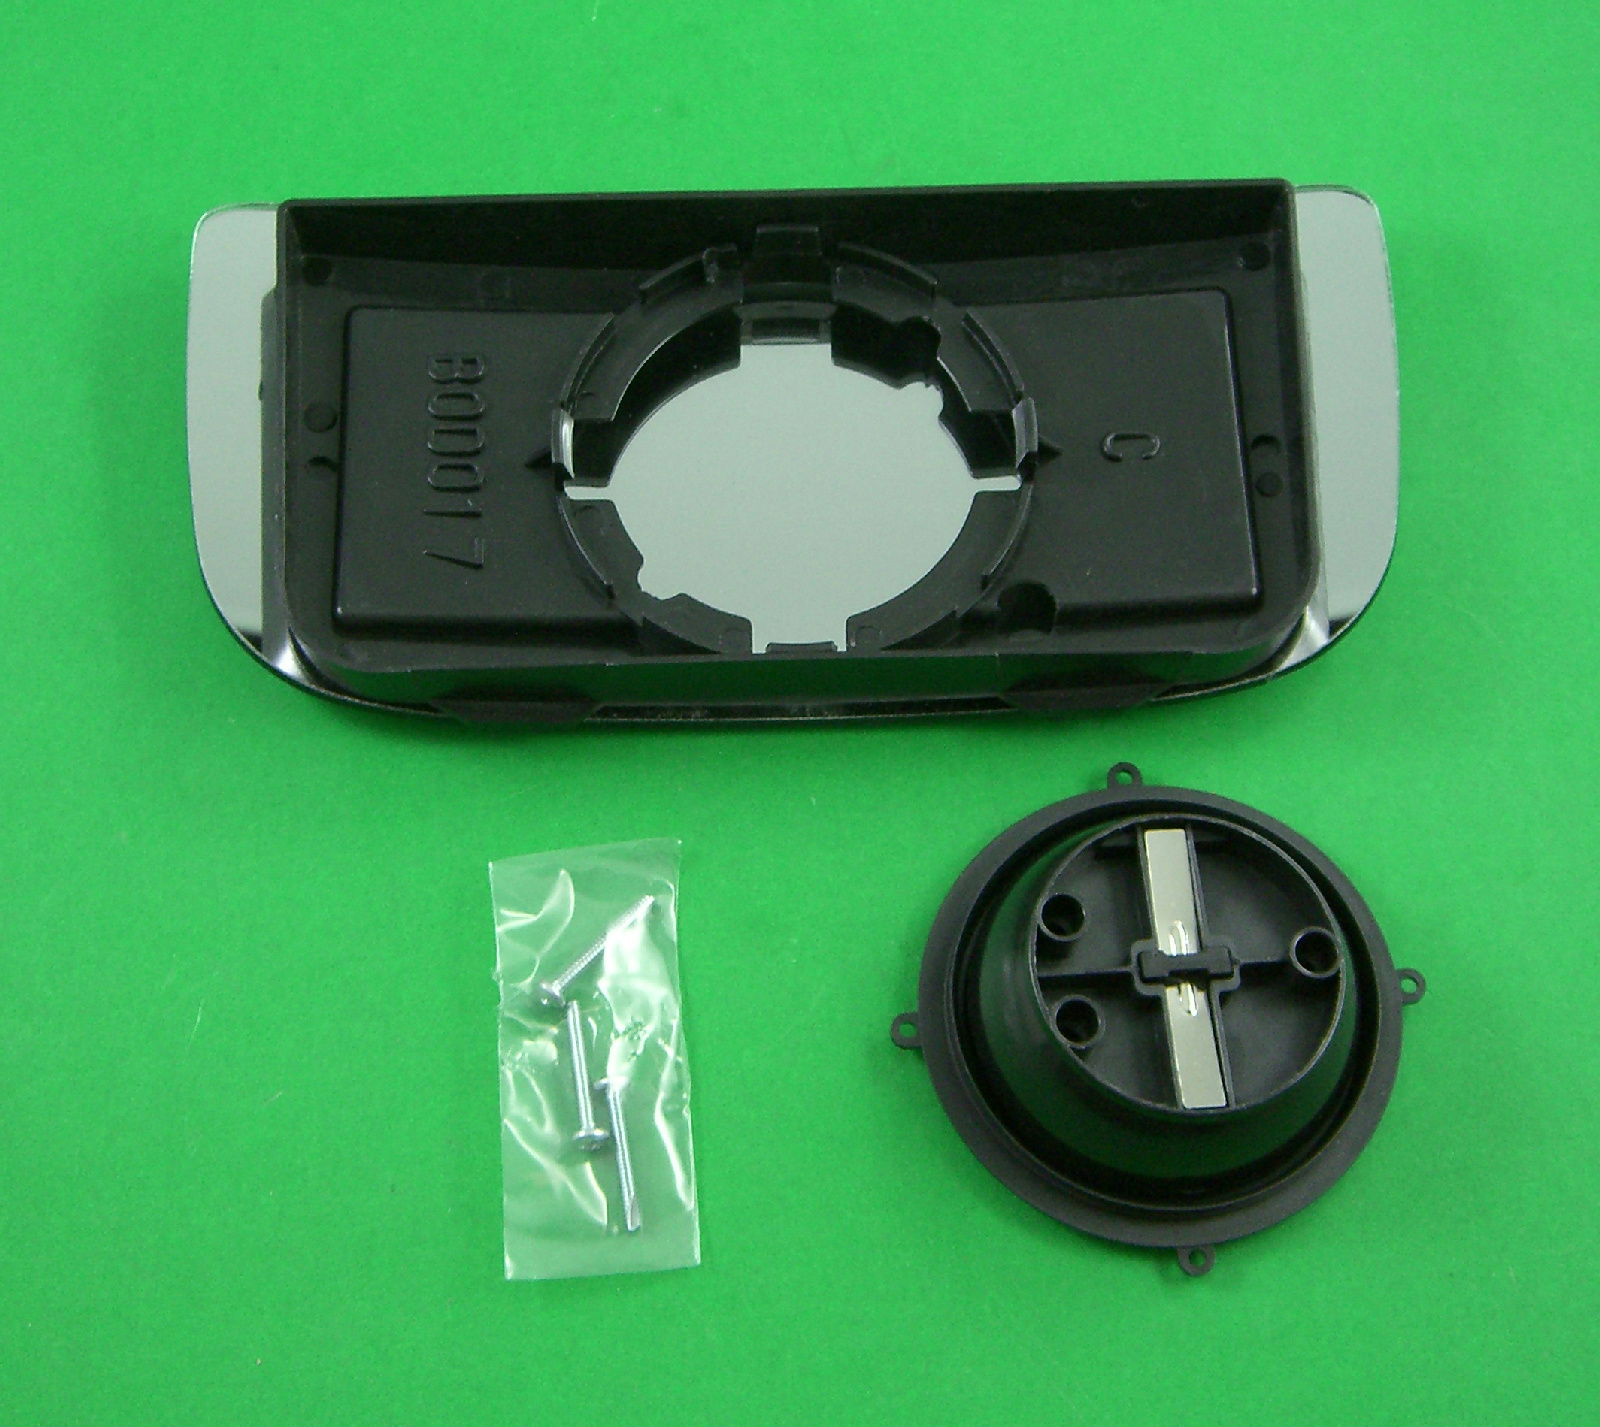 Ramco Engineering Gls602 Rv Snap On Convex Mirror Snp Gls602ws Ki